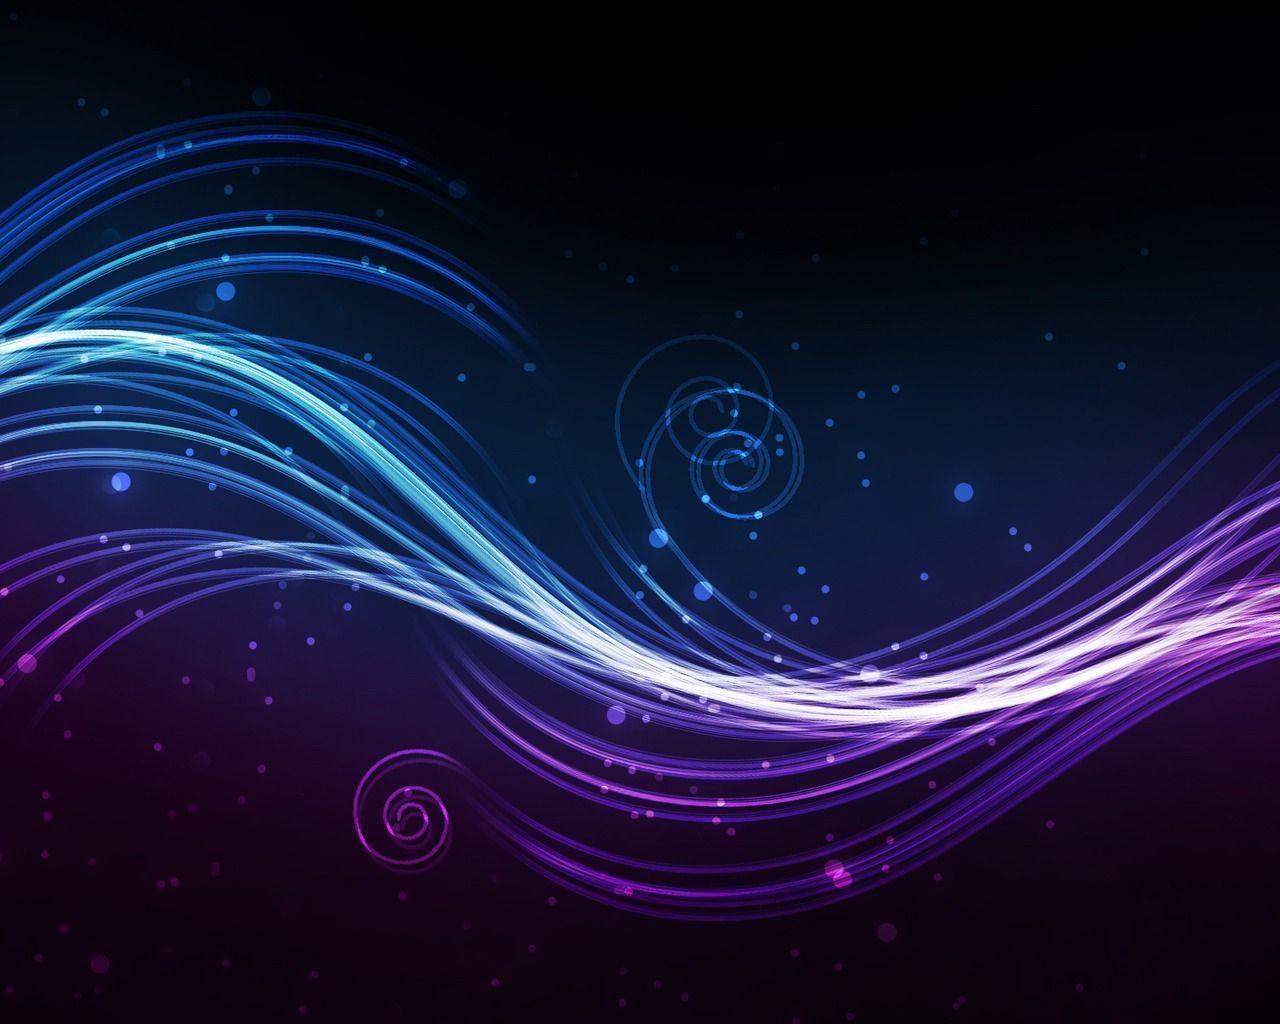 purple spidey computer wallpapers - photo #47